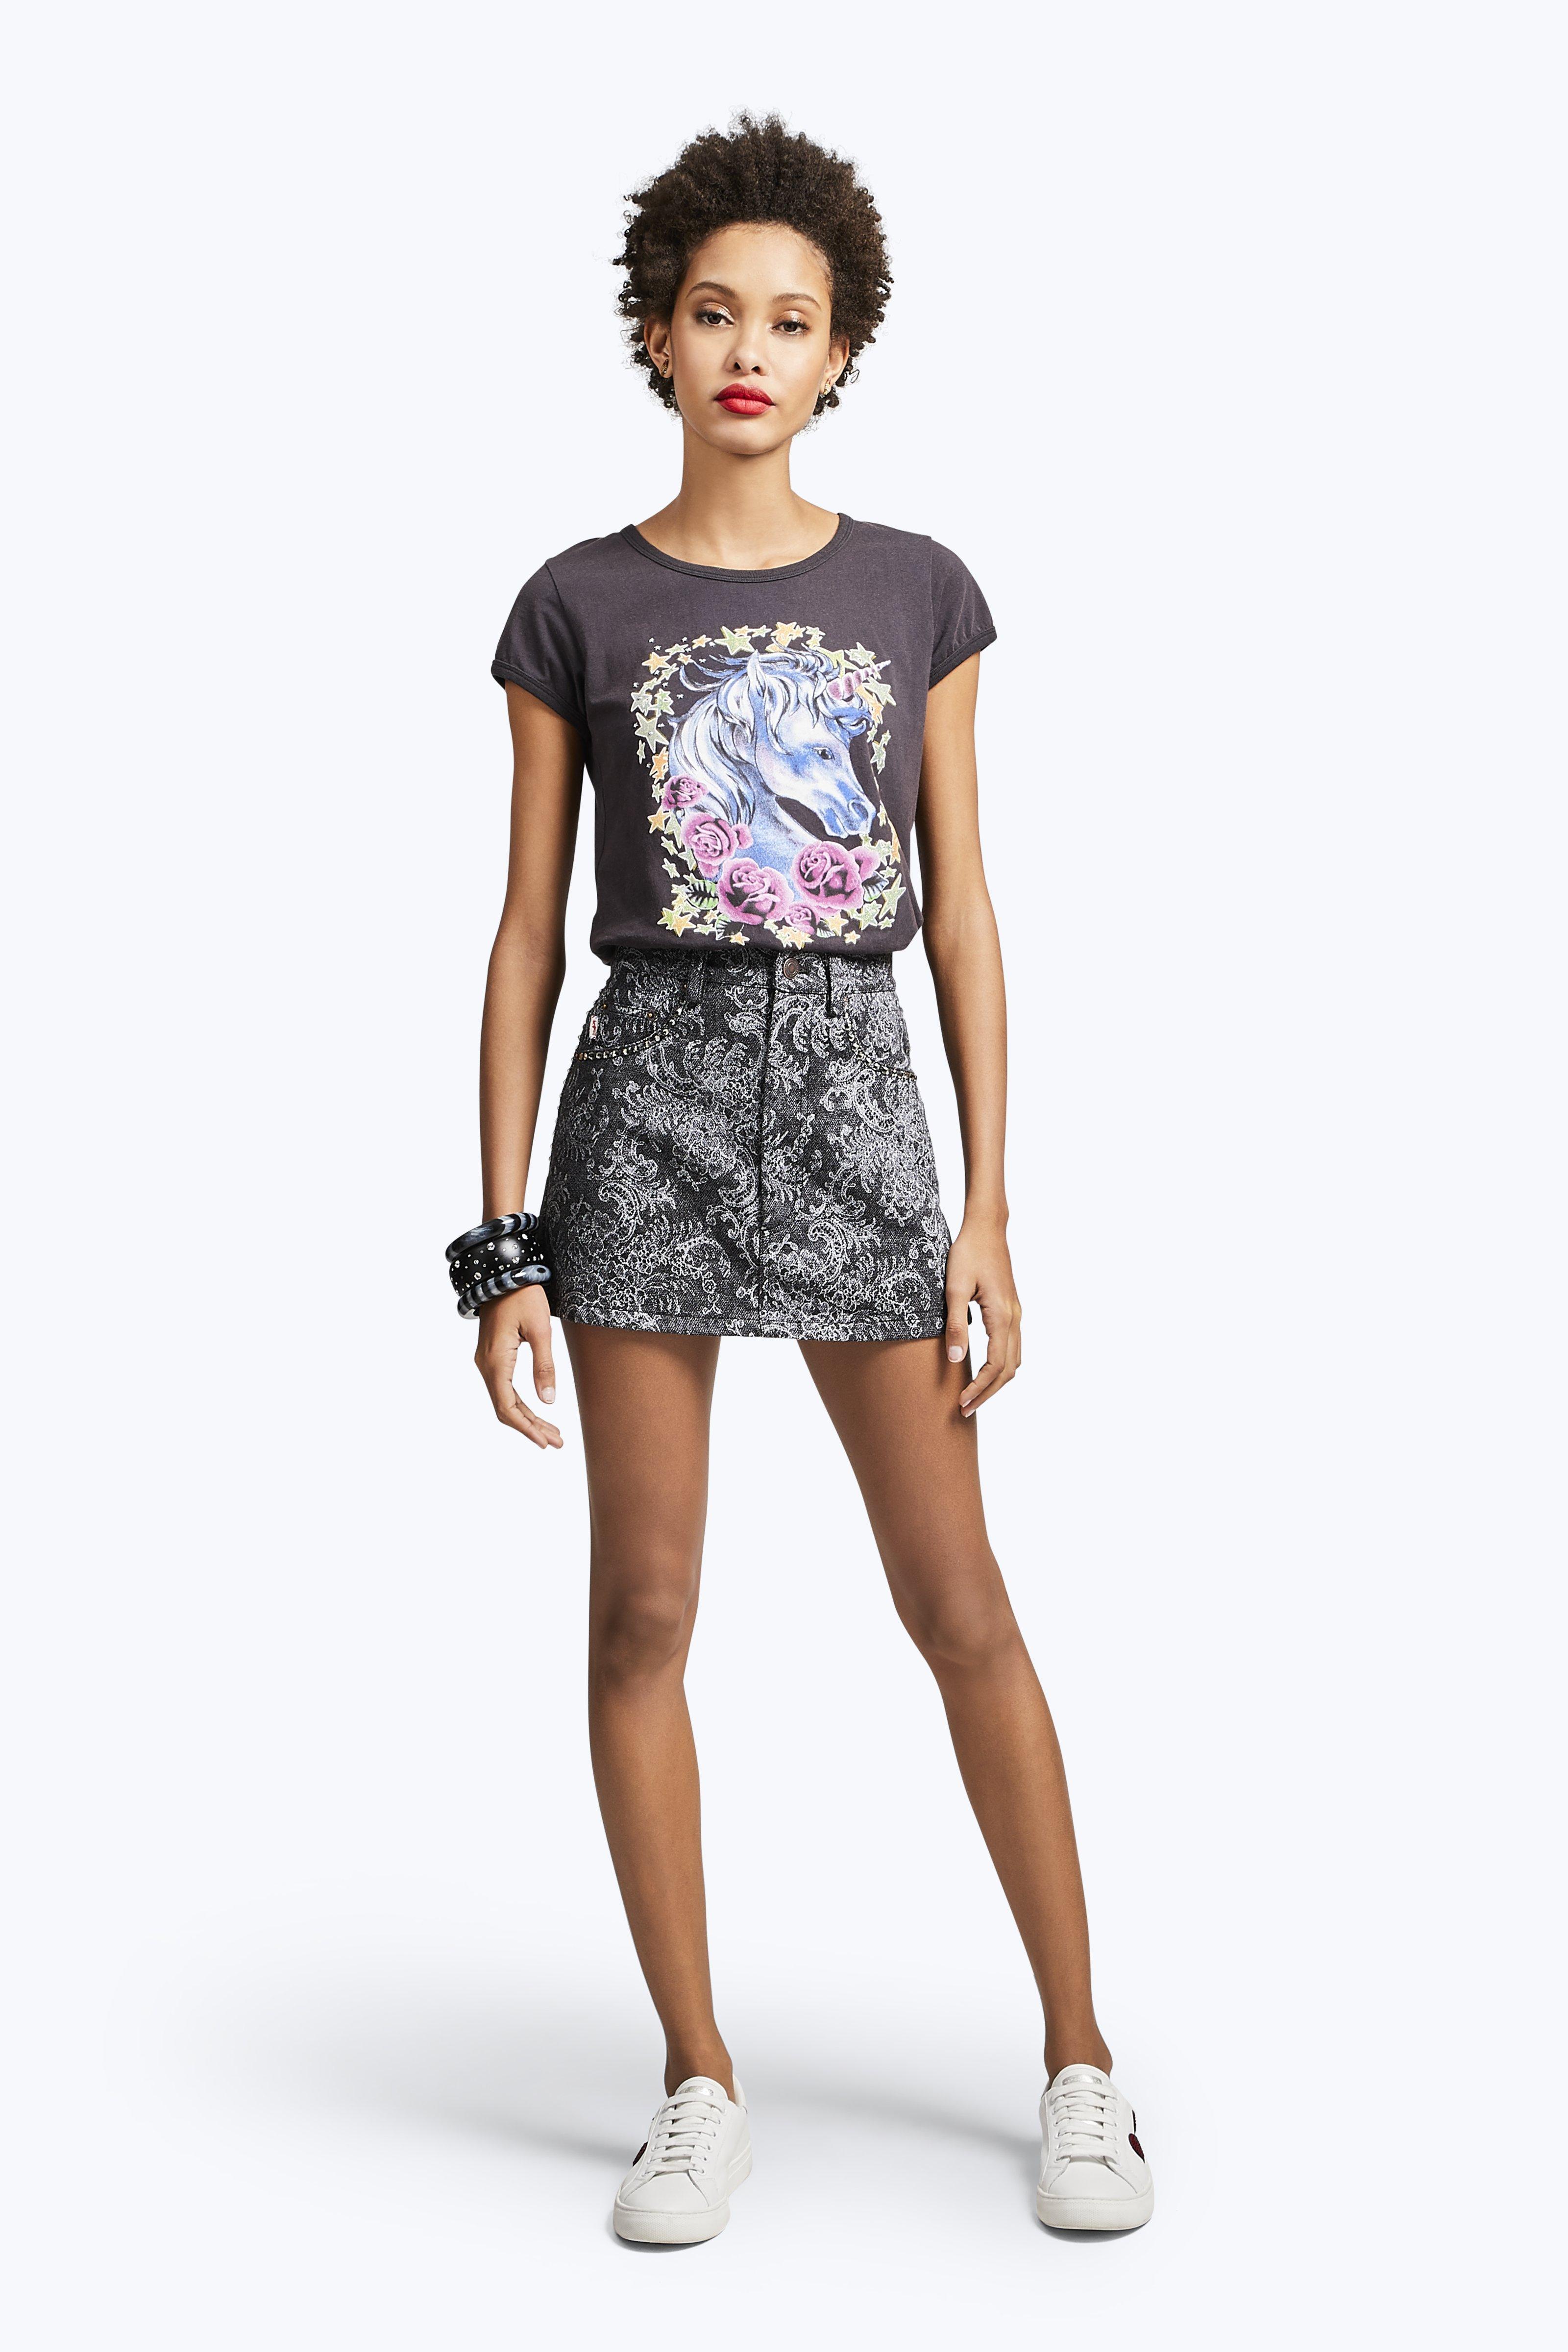 Marc Jacobs Embellished Denim Mini Skirt In Black Lace